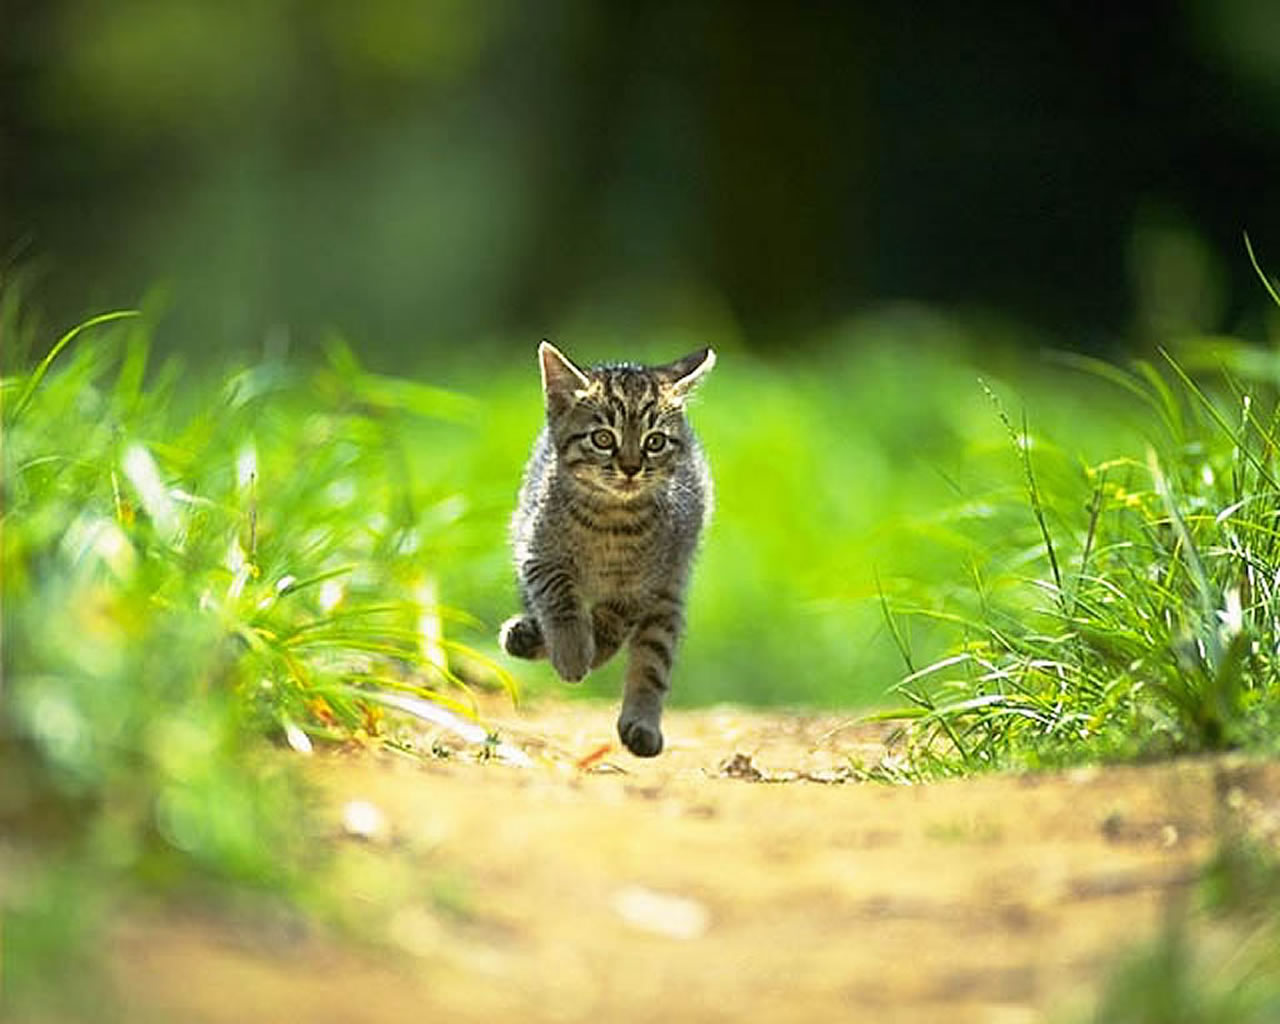 download wallpaper: een rennende kat wallpaper